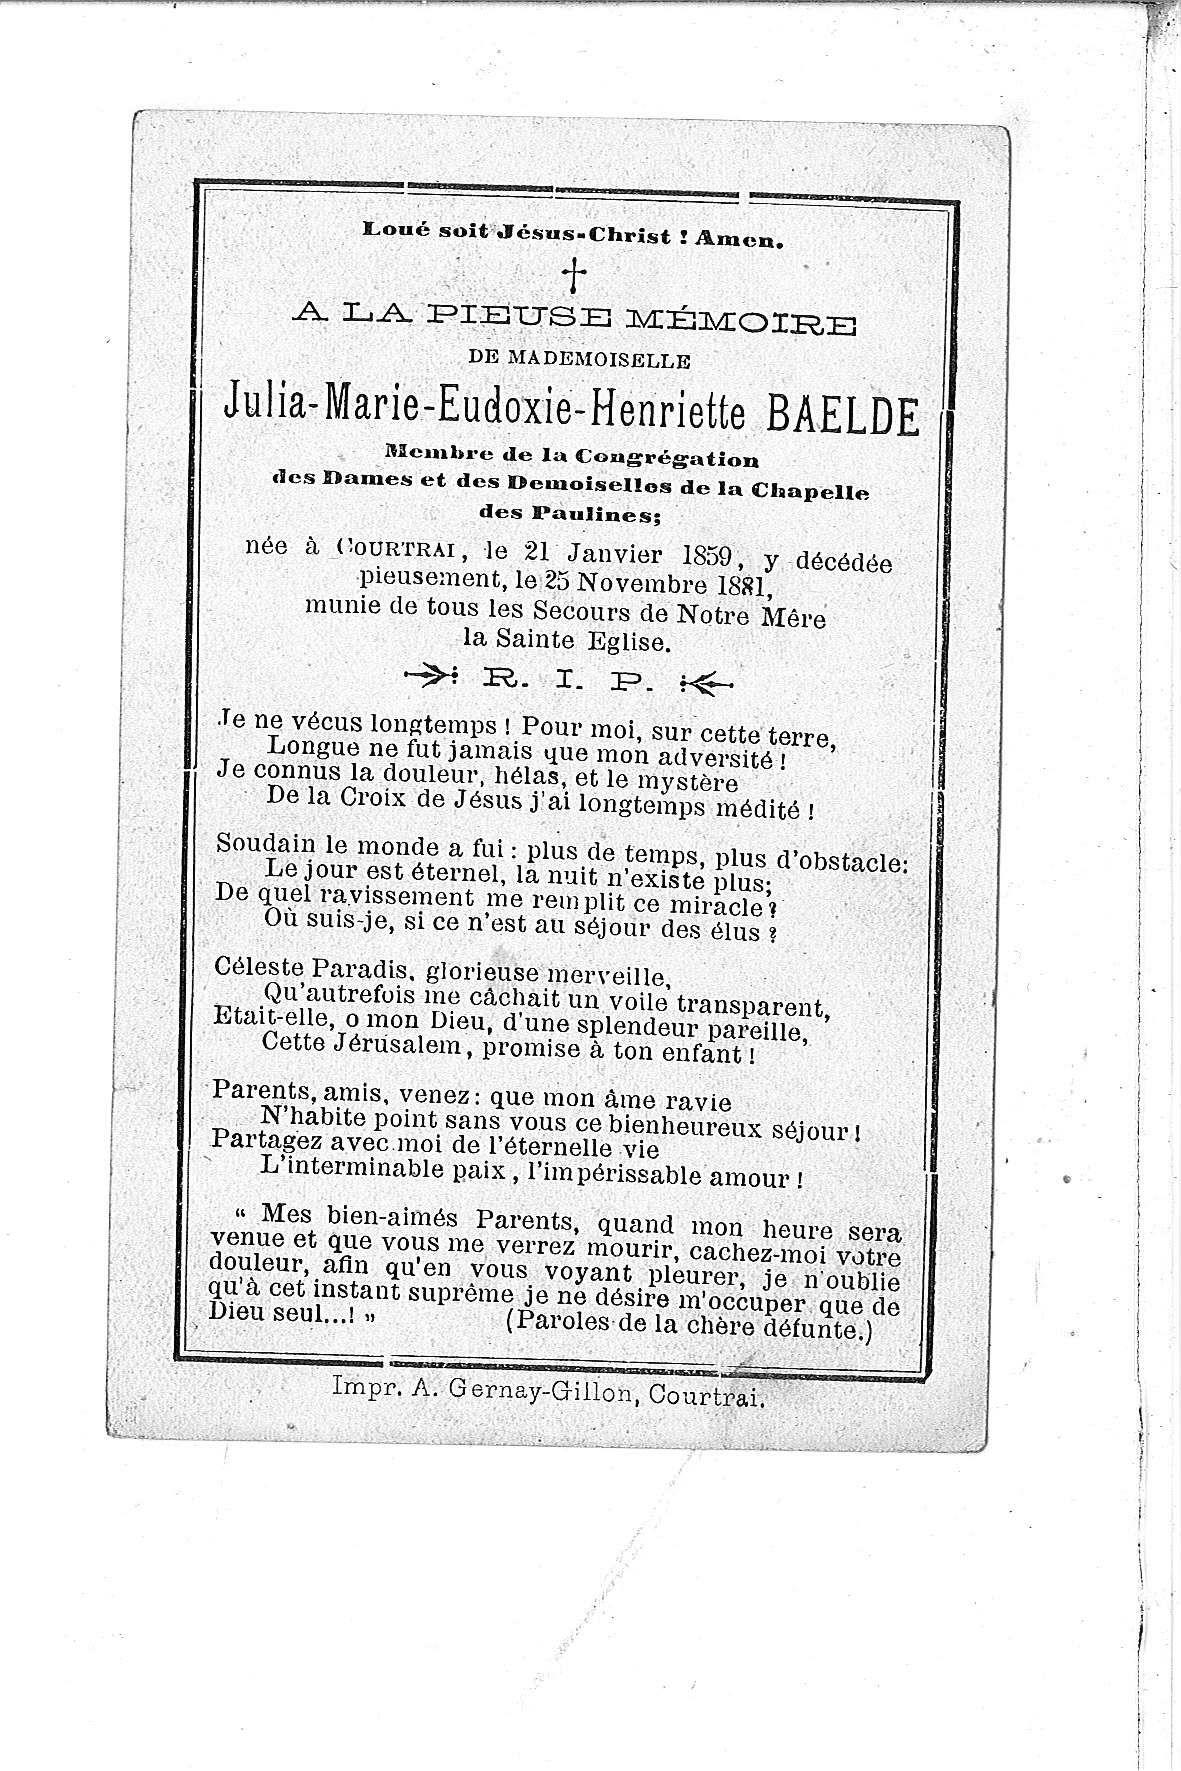 Julia-Marie-Eudoxie-Henriette(1881)20100928114856_00012.jpg